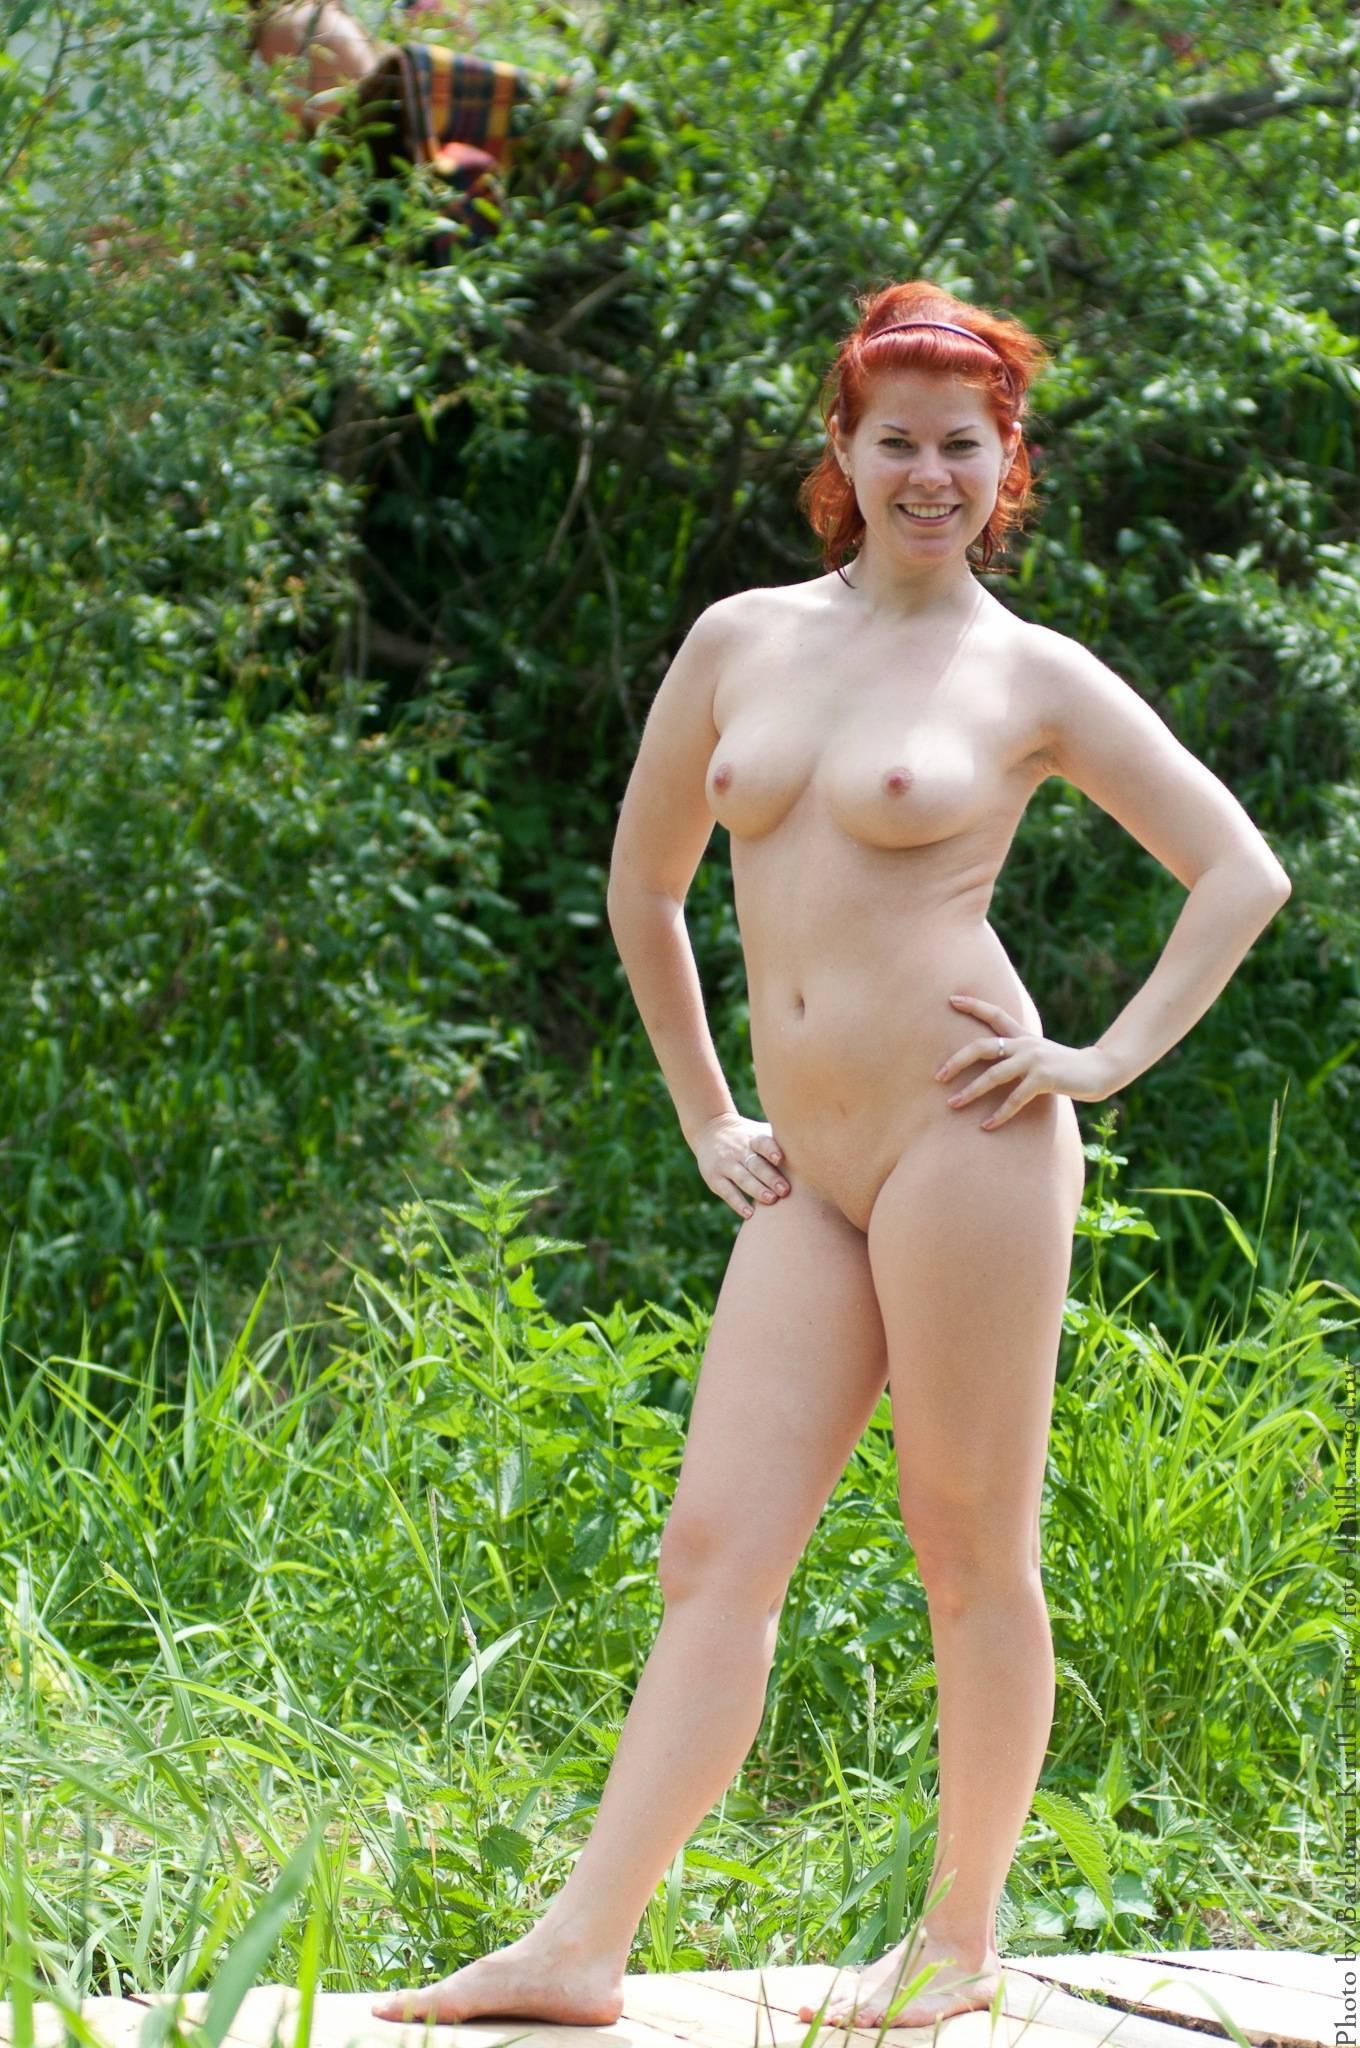 Nudist camp EmptyHills 2011 - 2